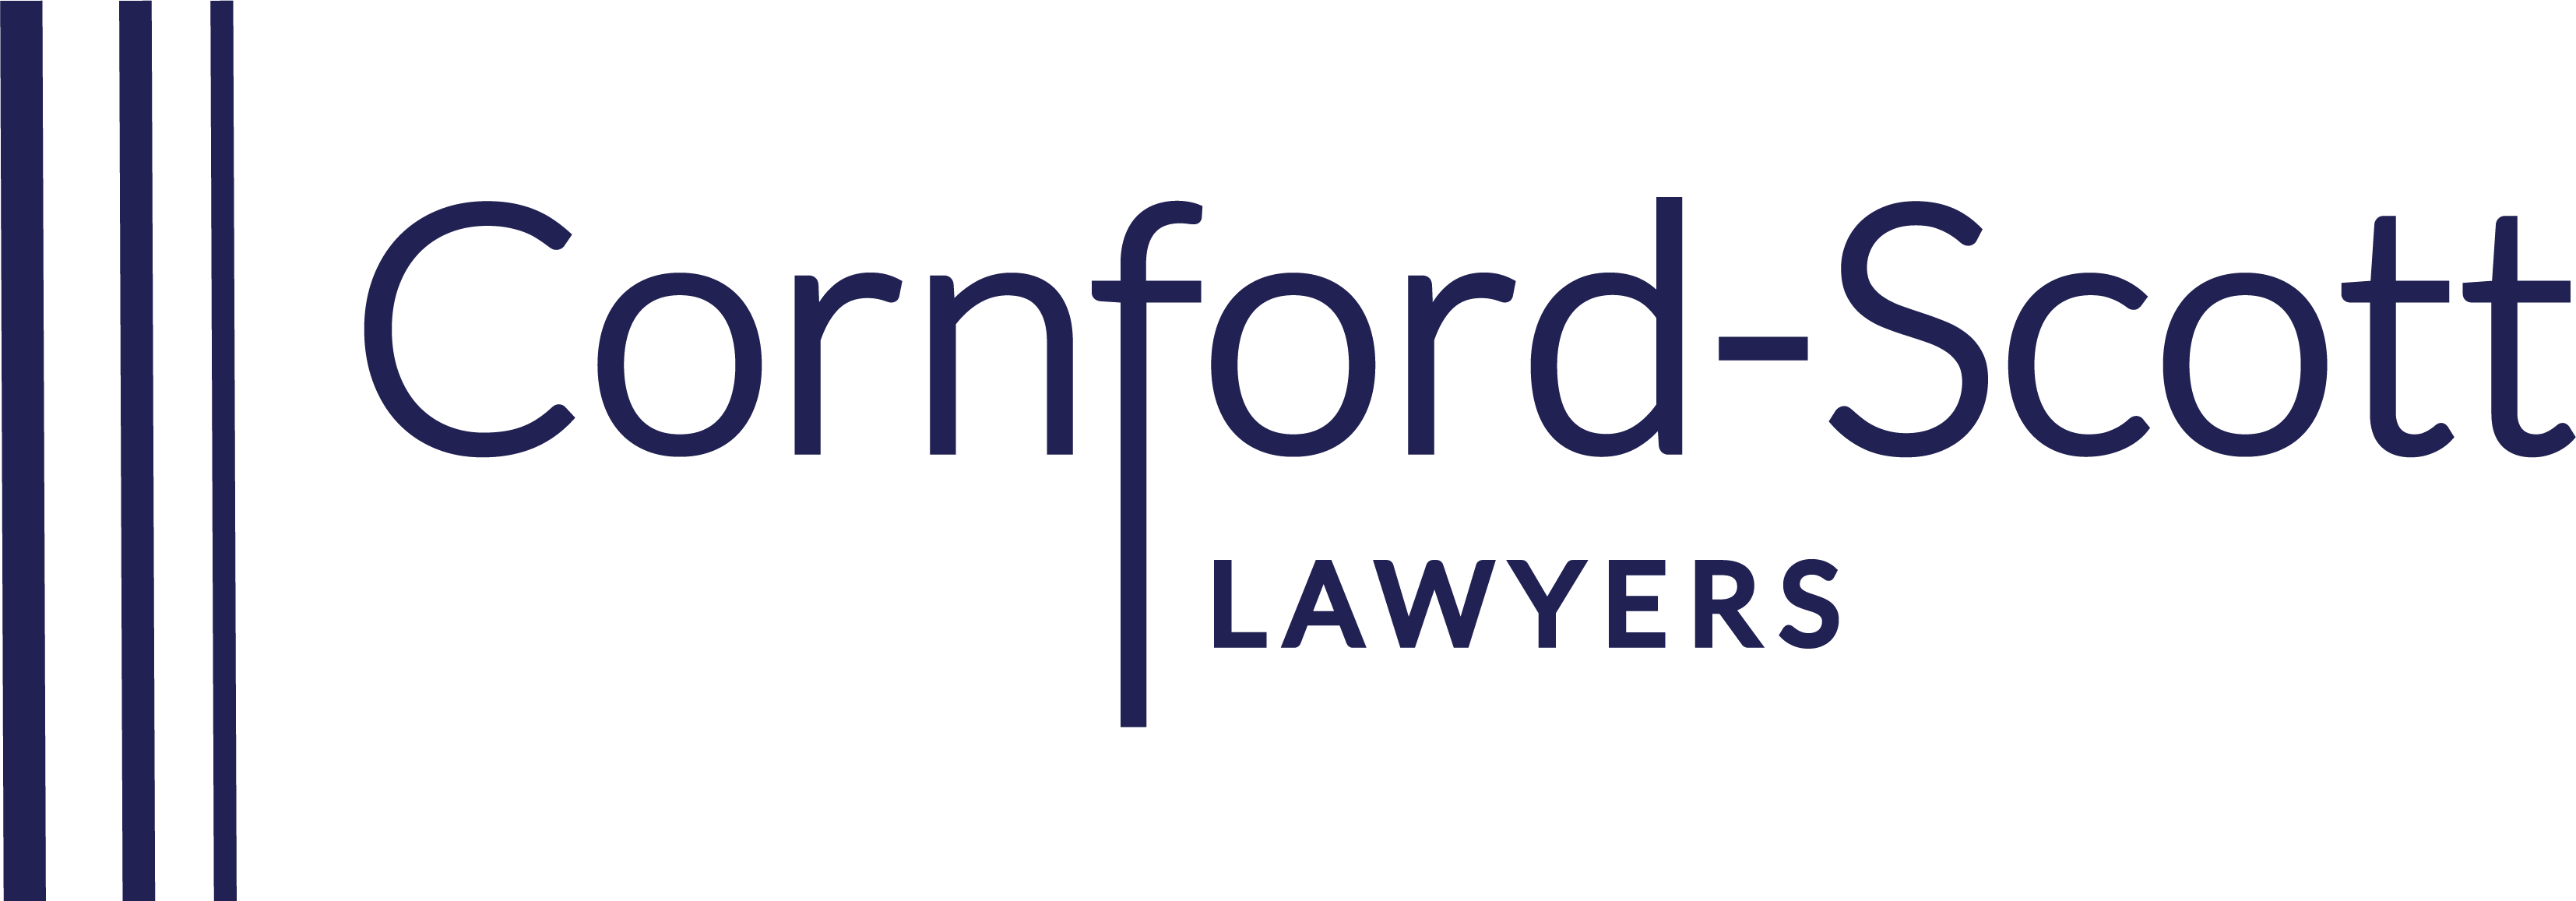 Cornford-Scott Lawyers